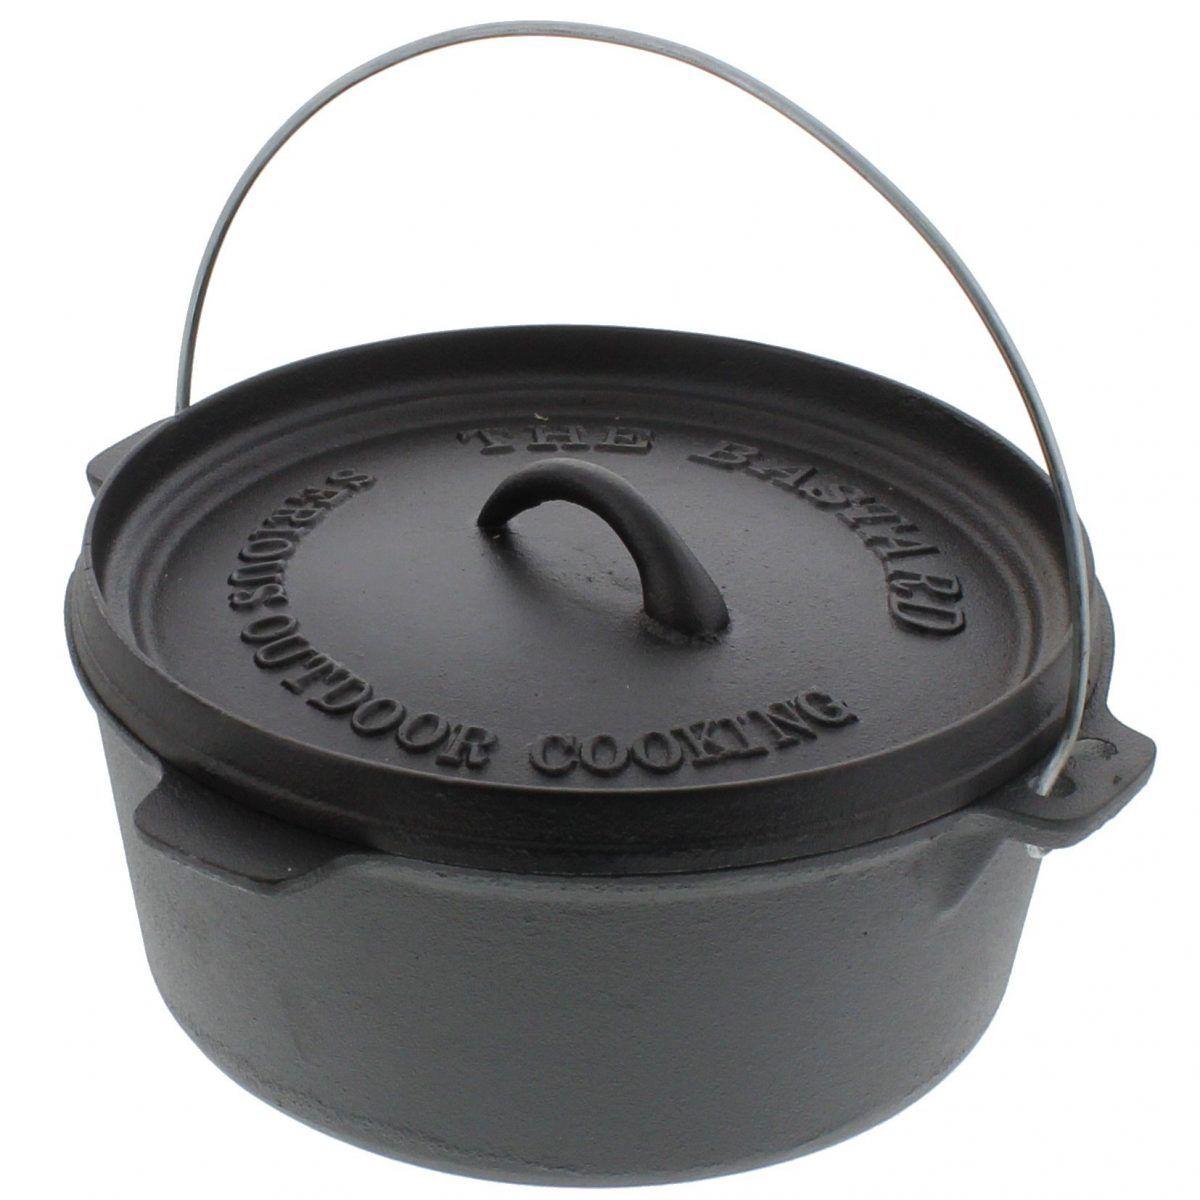 dutch-oven-the-bastard